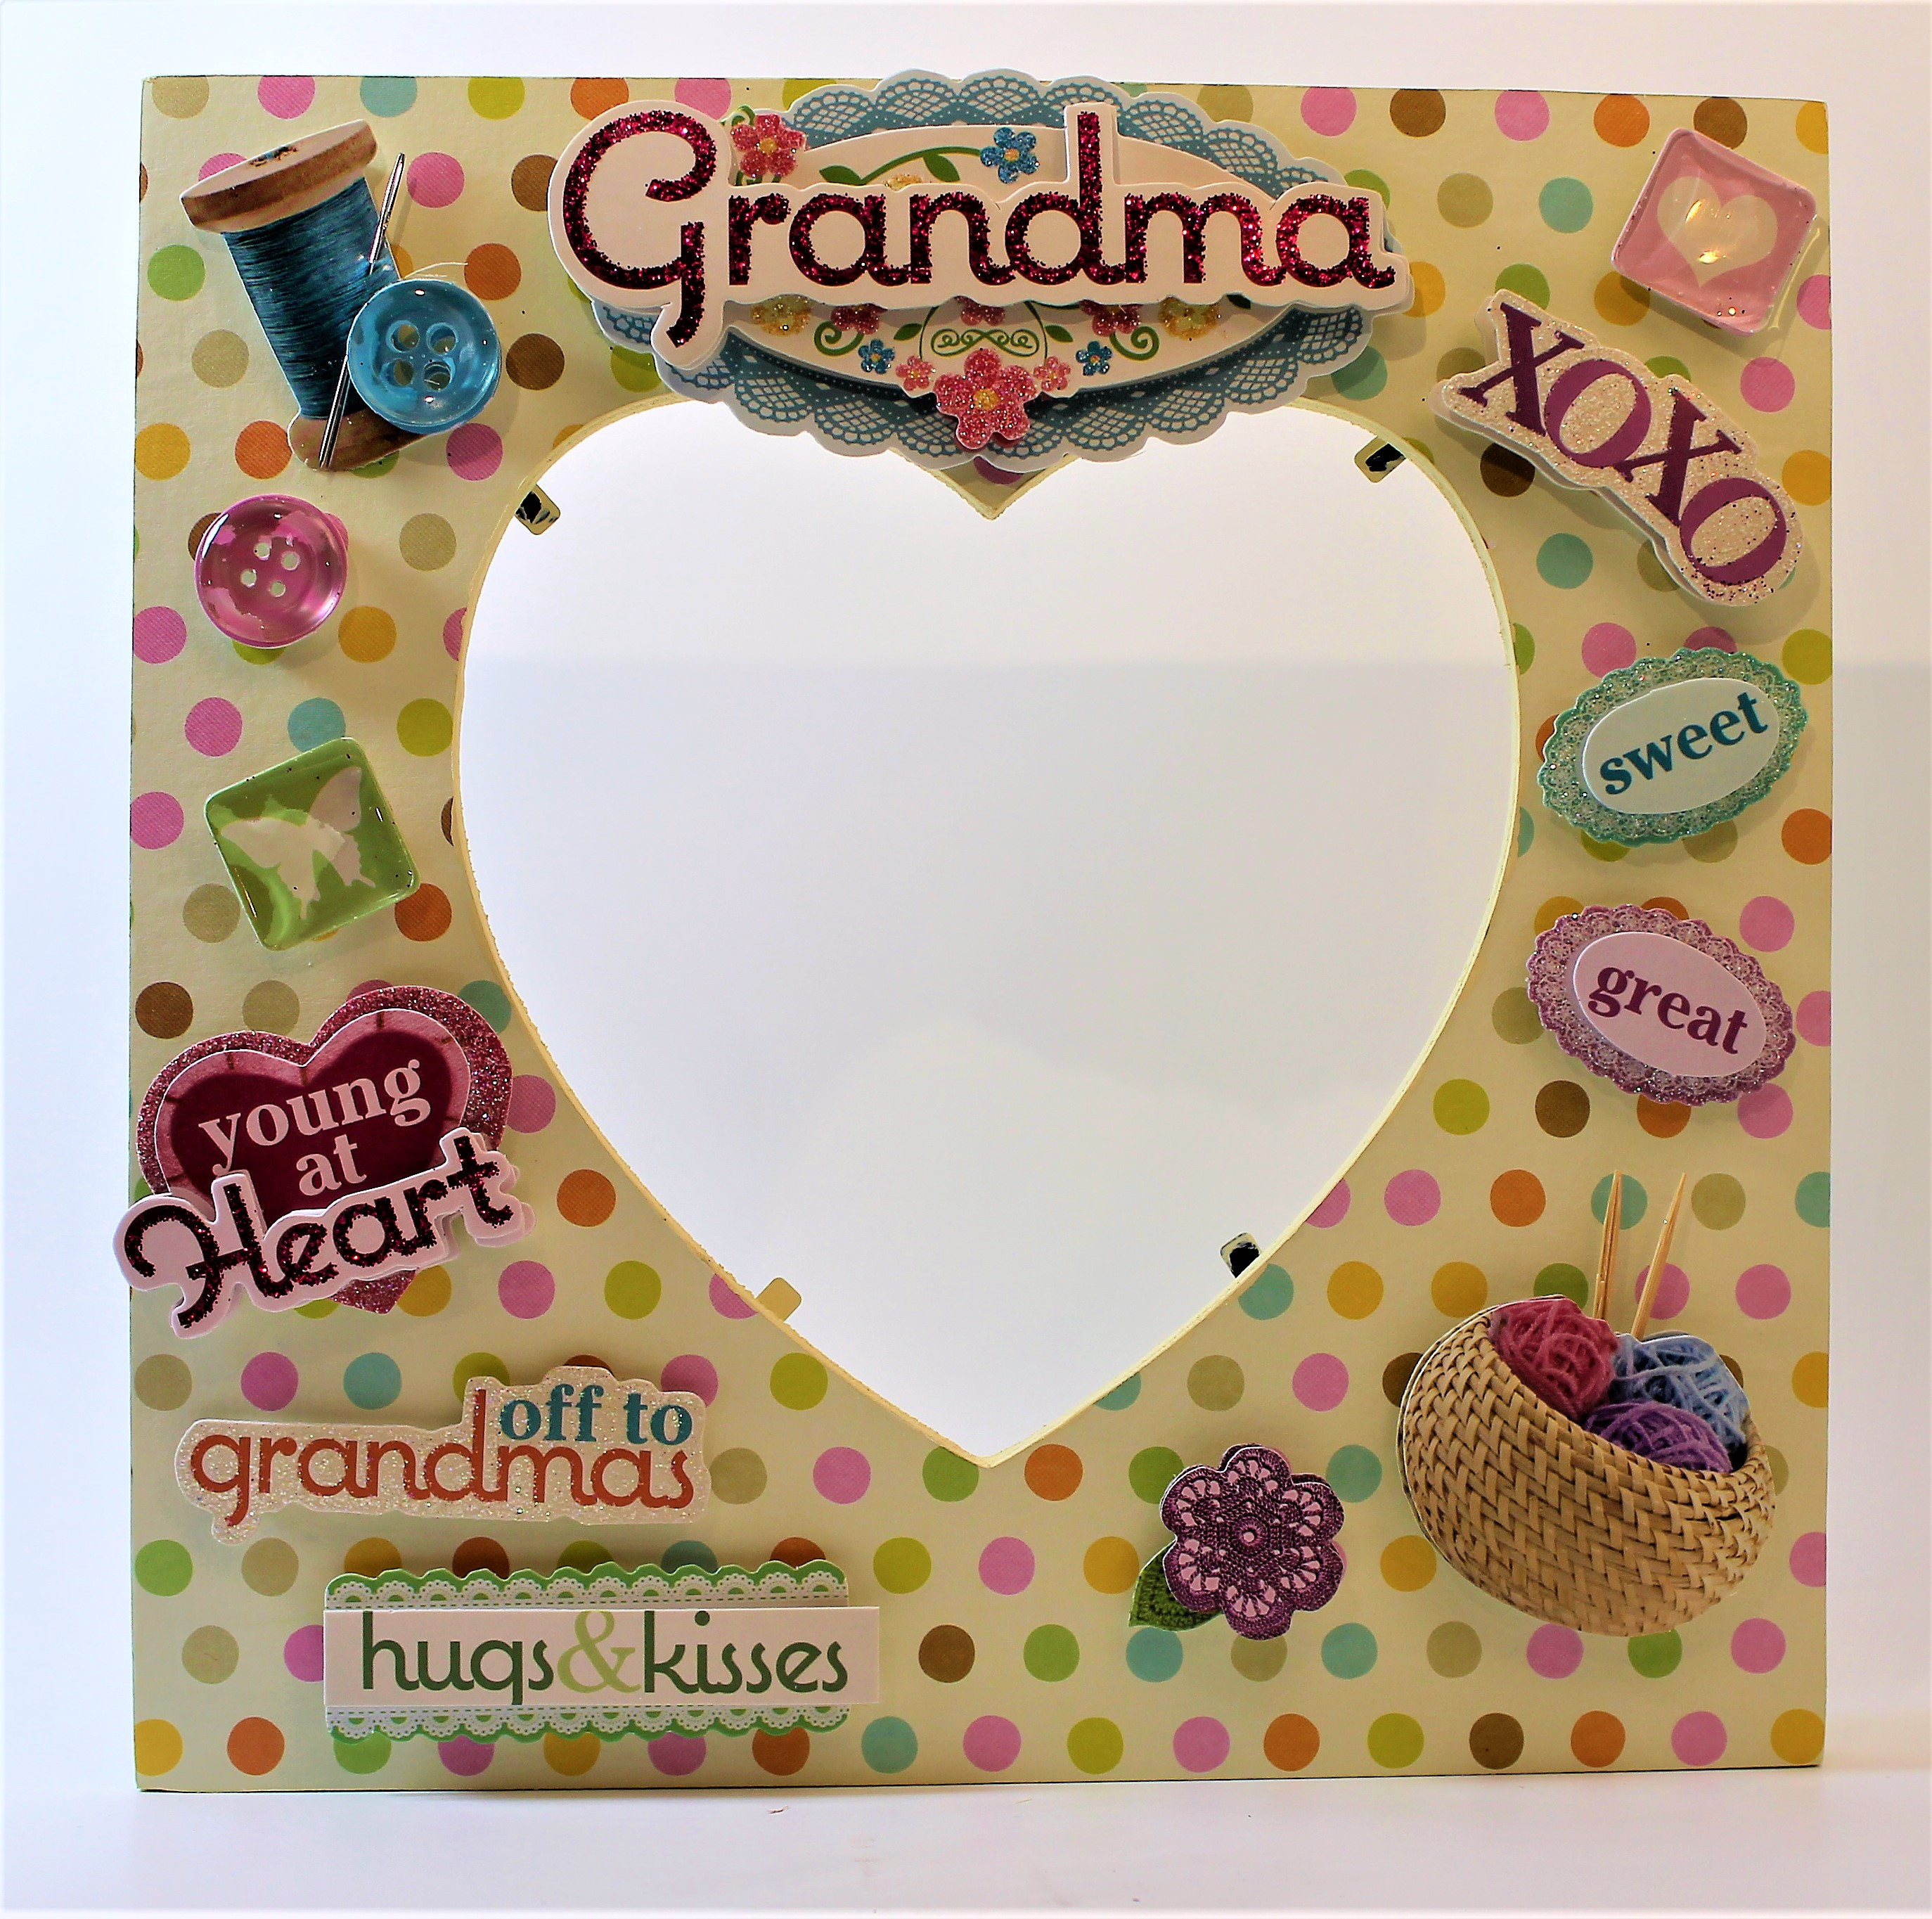 Abuela cuadro/Grandmom marco/abuela marco/Nana marco/MiMaw marco ...